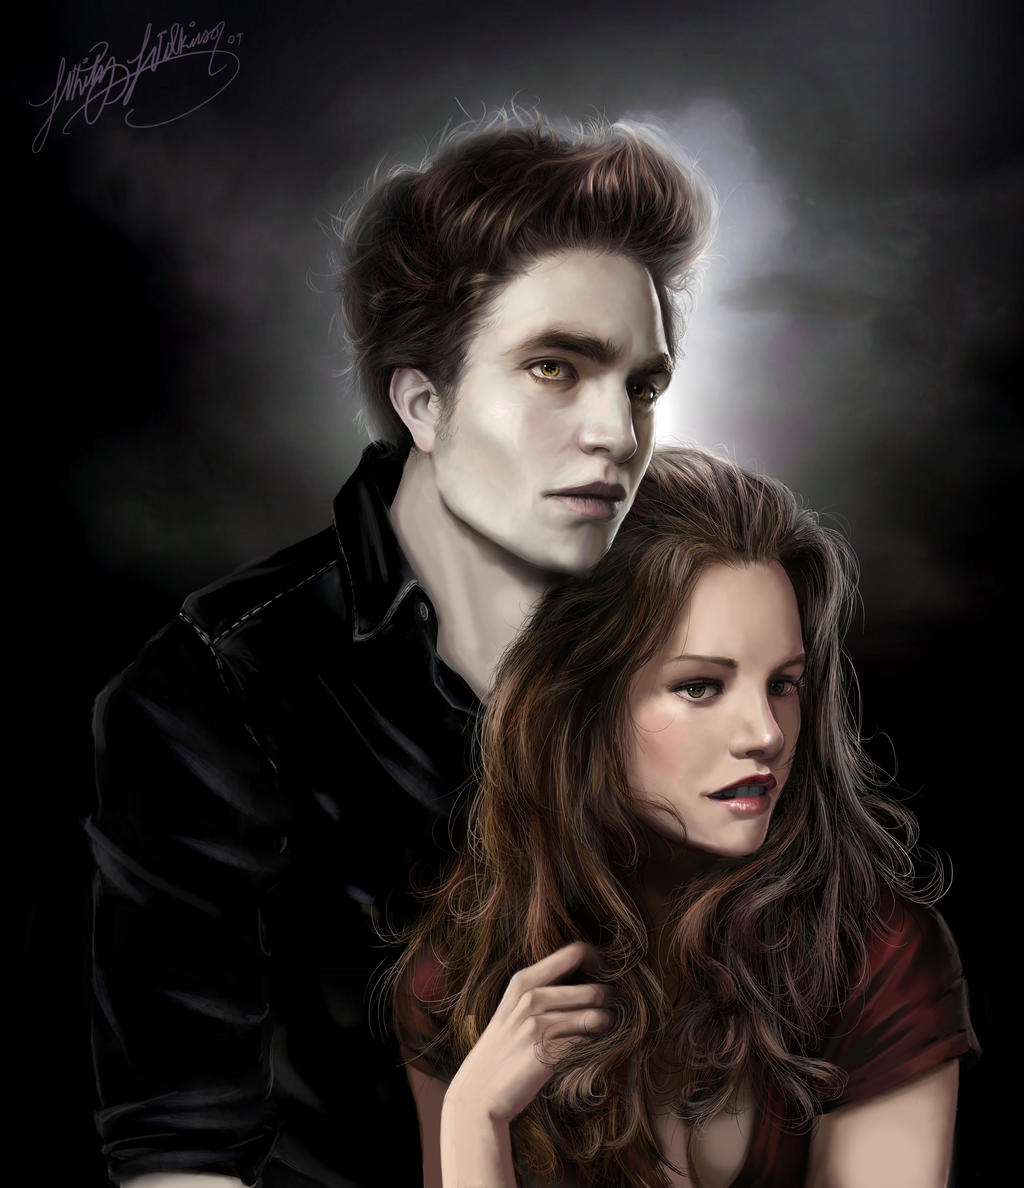 Edward and Bella by whitneyw